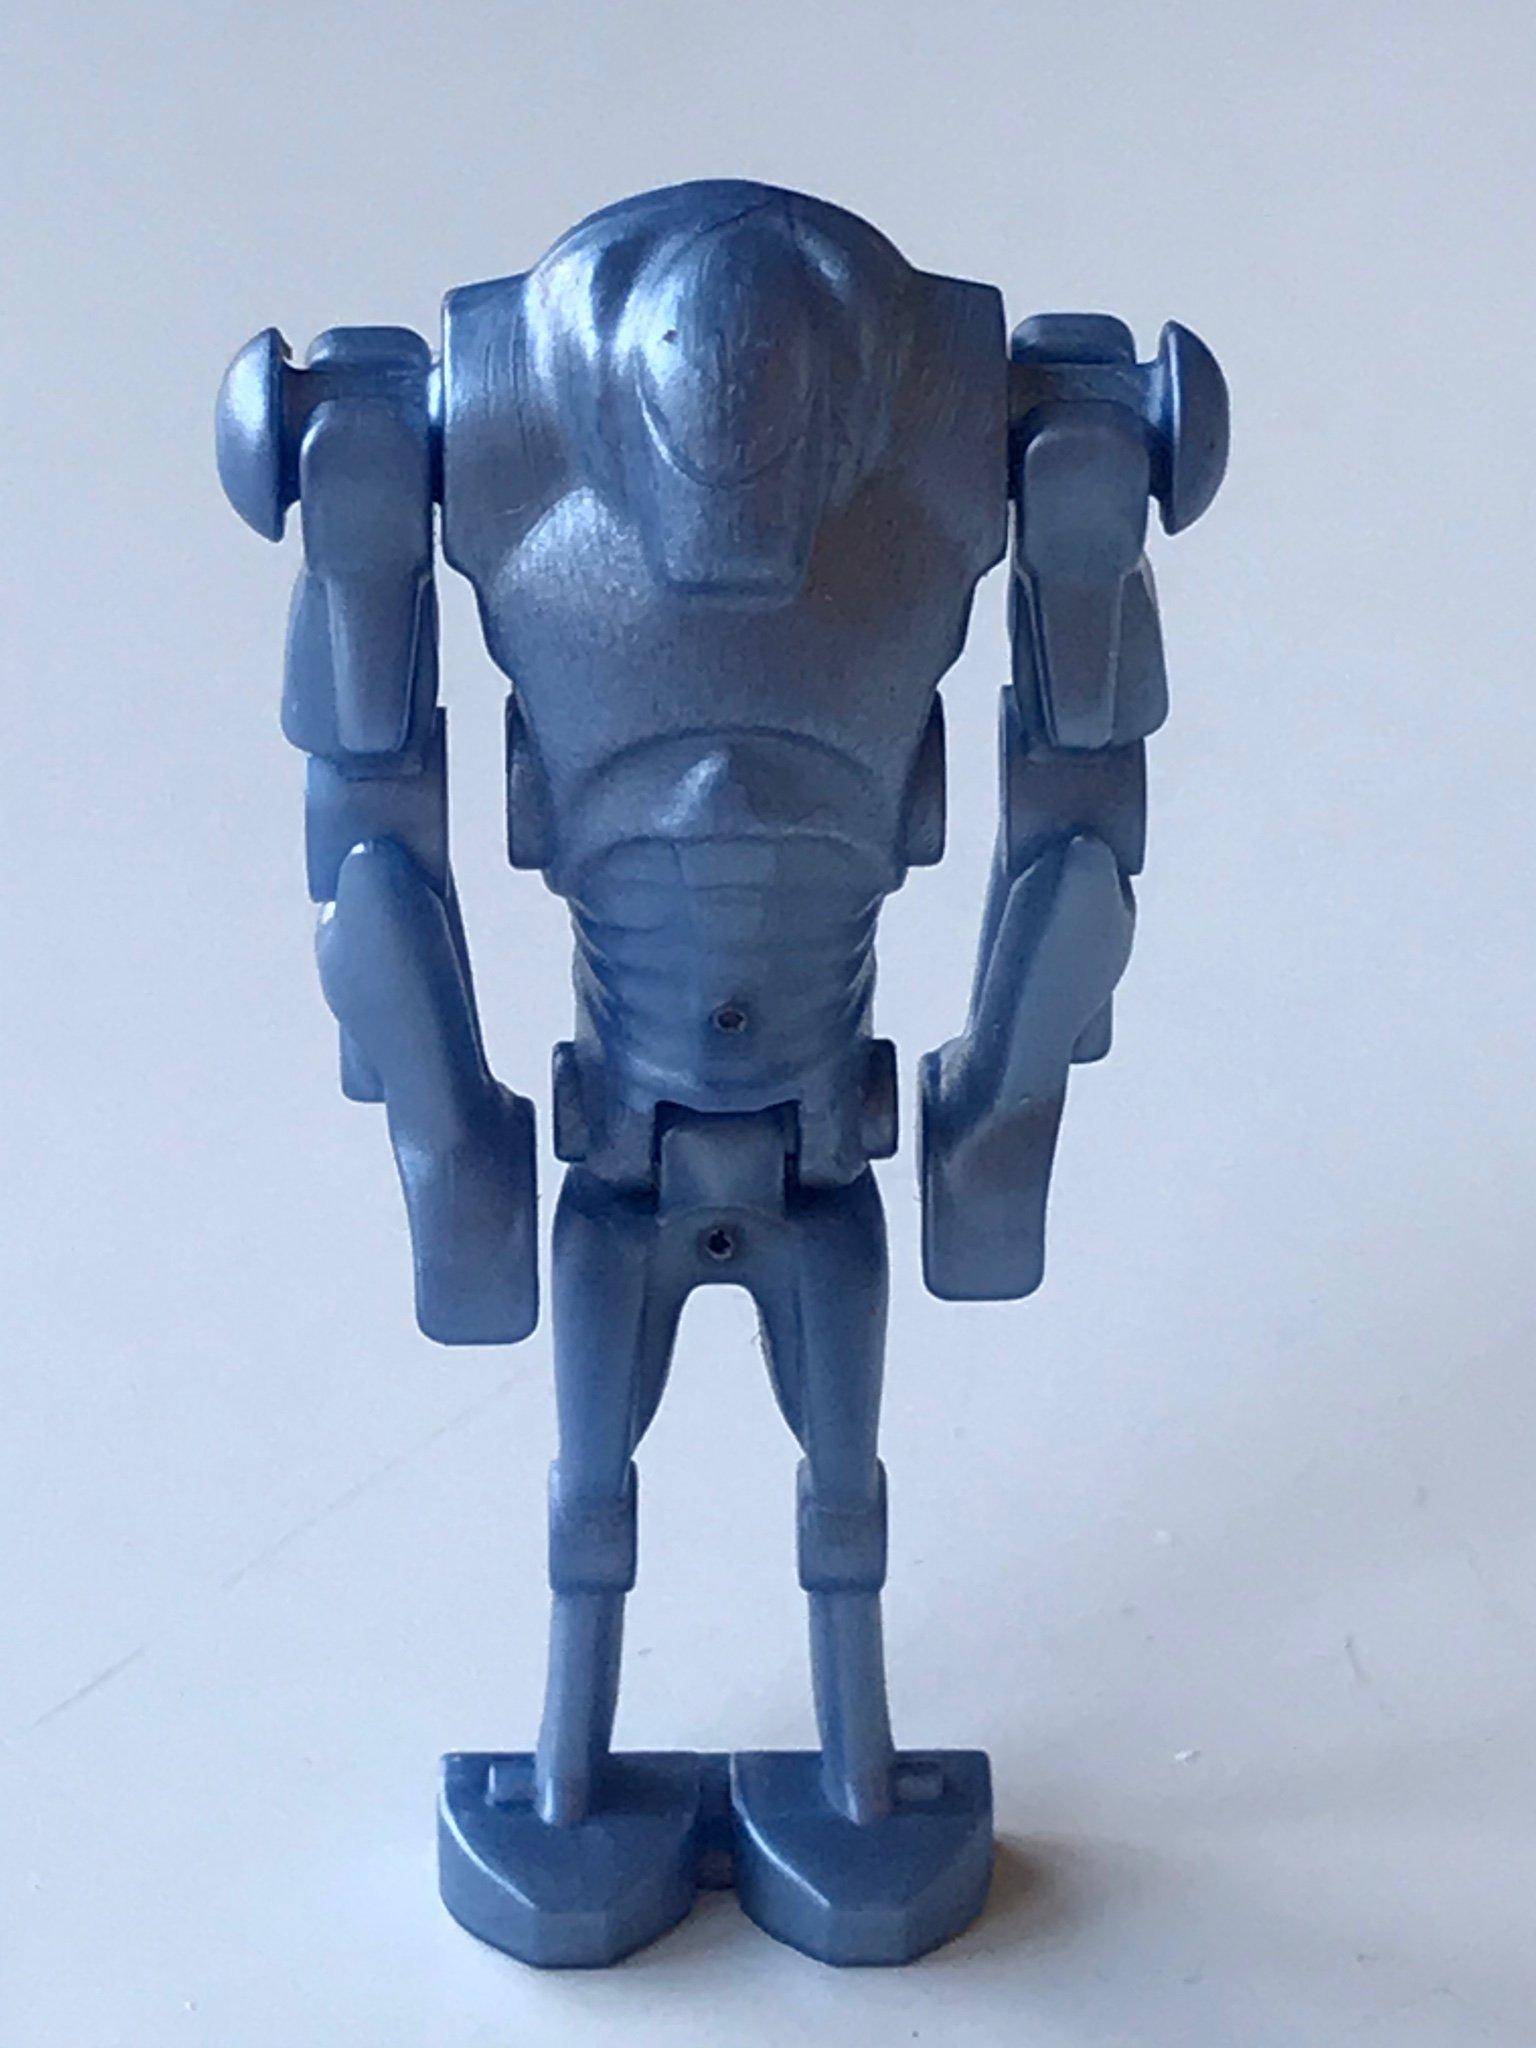 7163 AS-IS Blue Super Battle Droid Arm LEGO Star Wars Minifigure PART ONLY